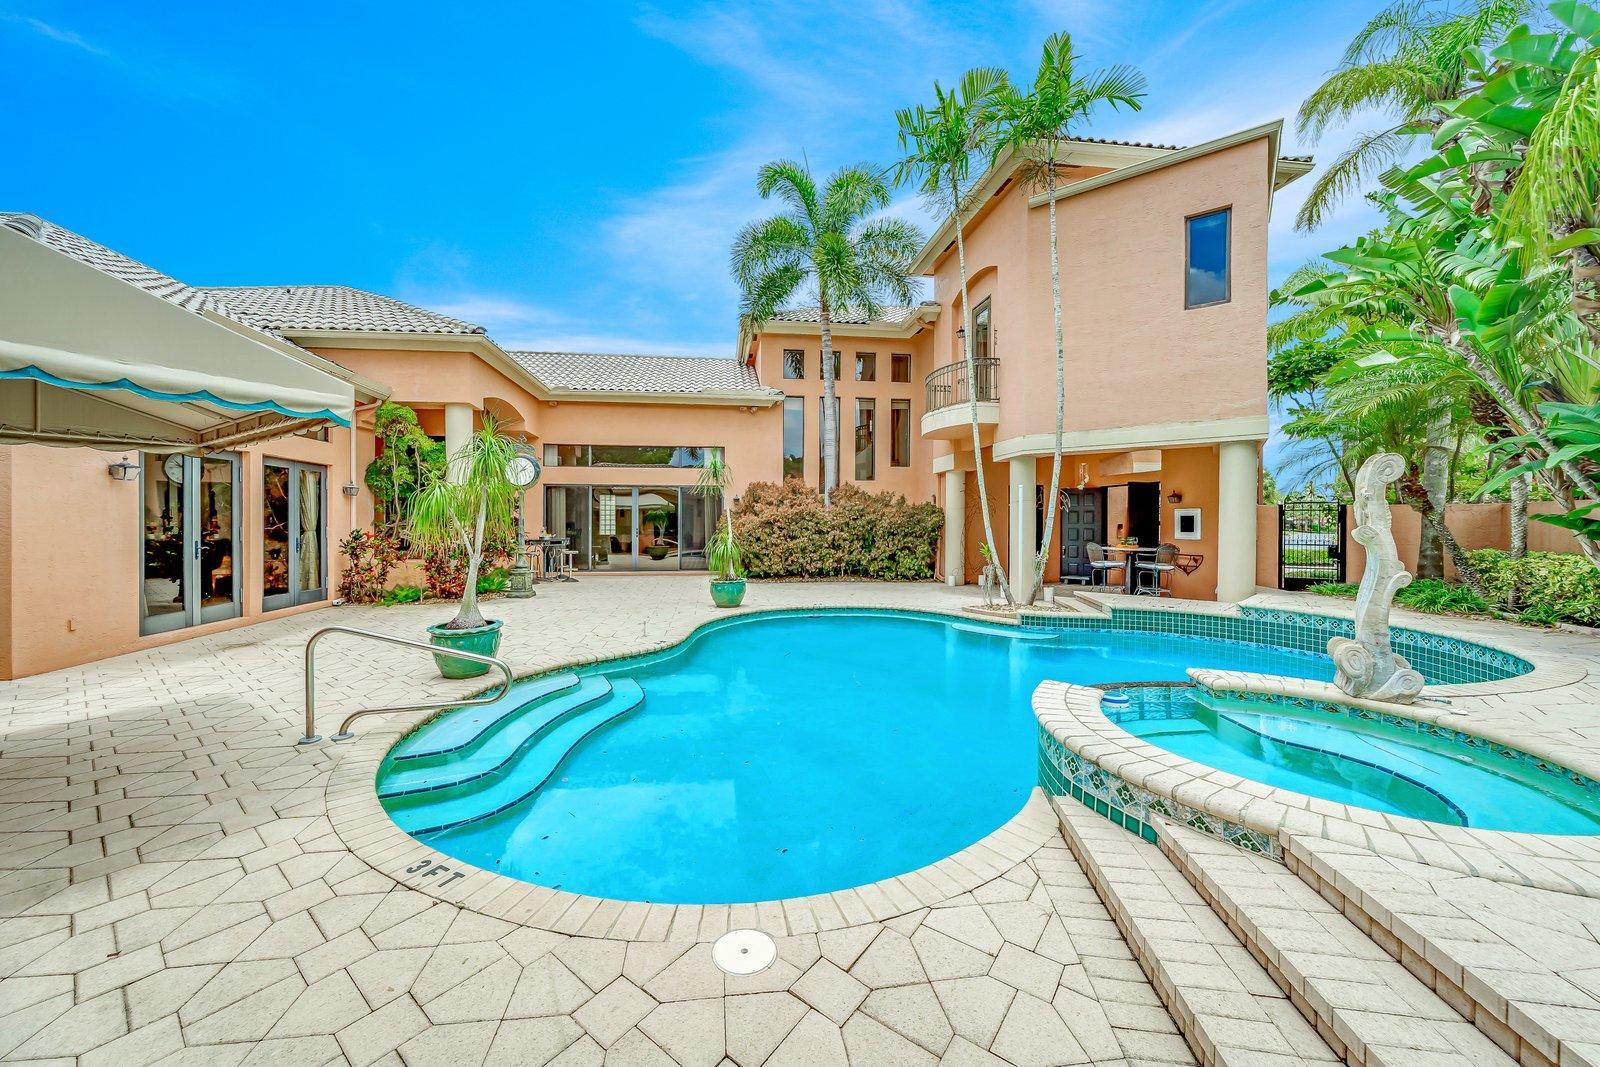 Home for sale in Boca Pointe, El Dorado Court Boca Raton Florida